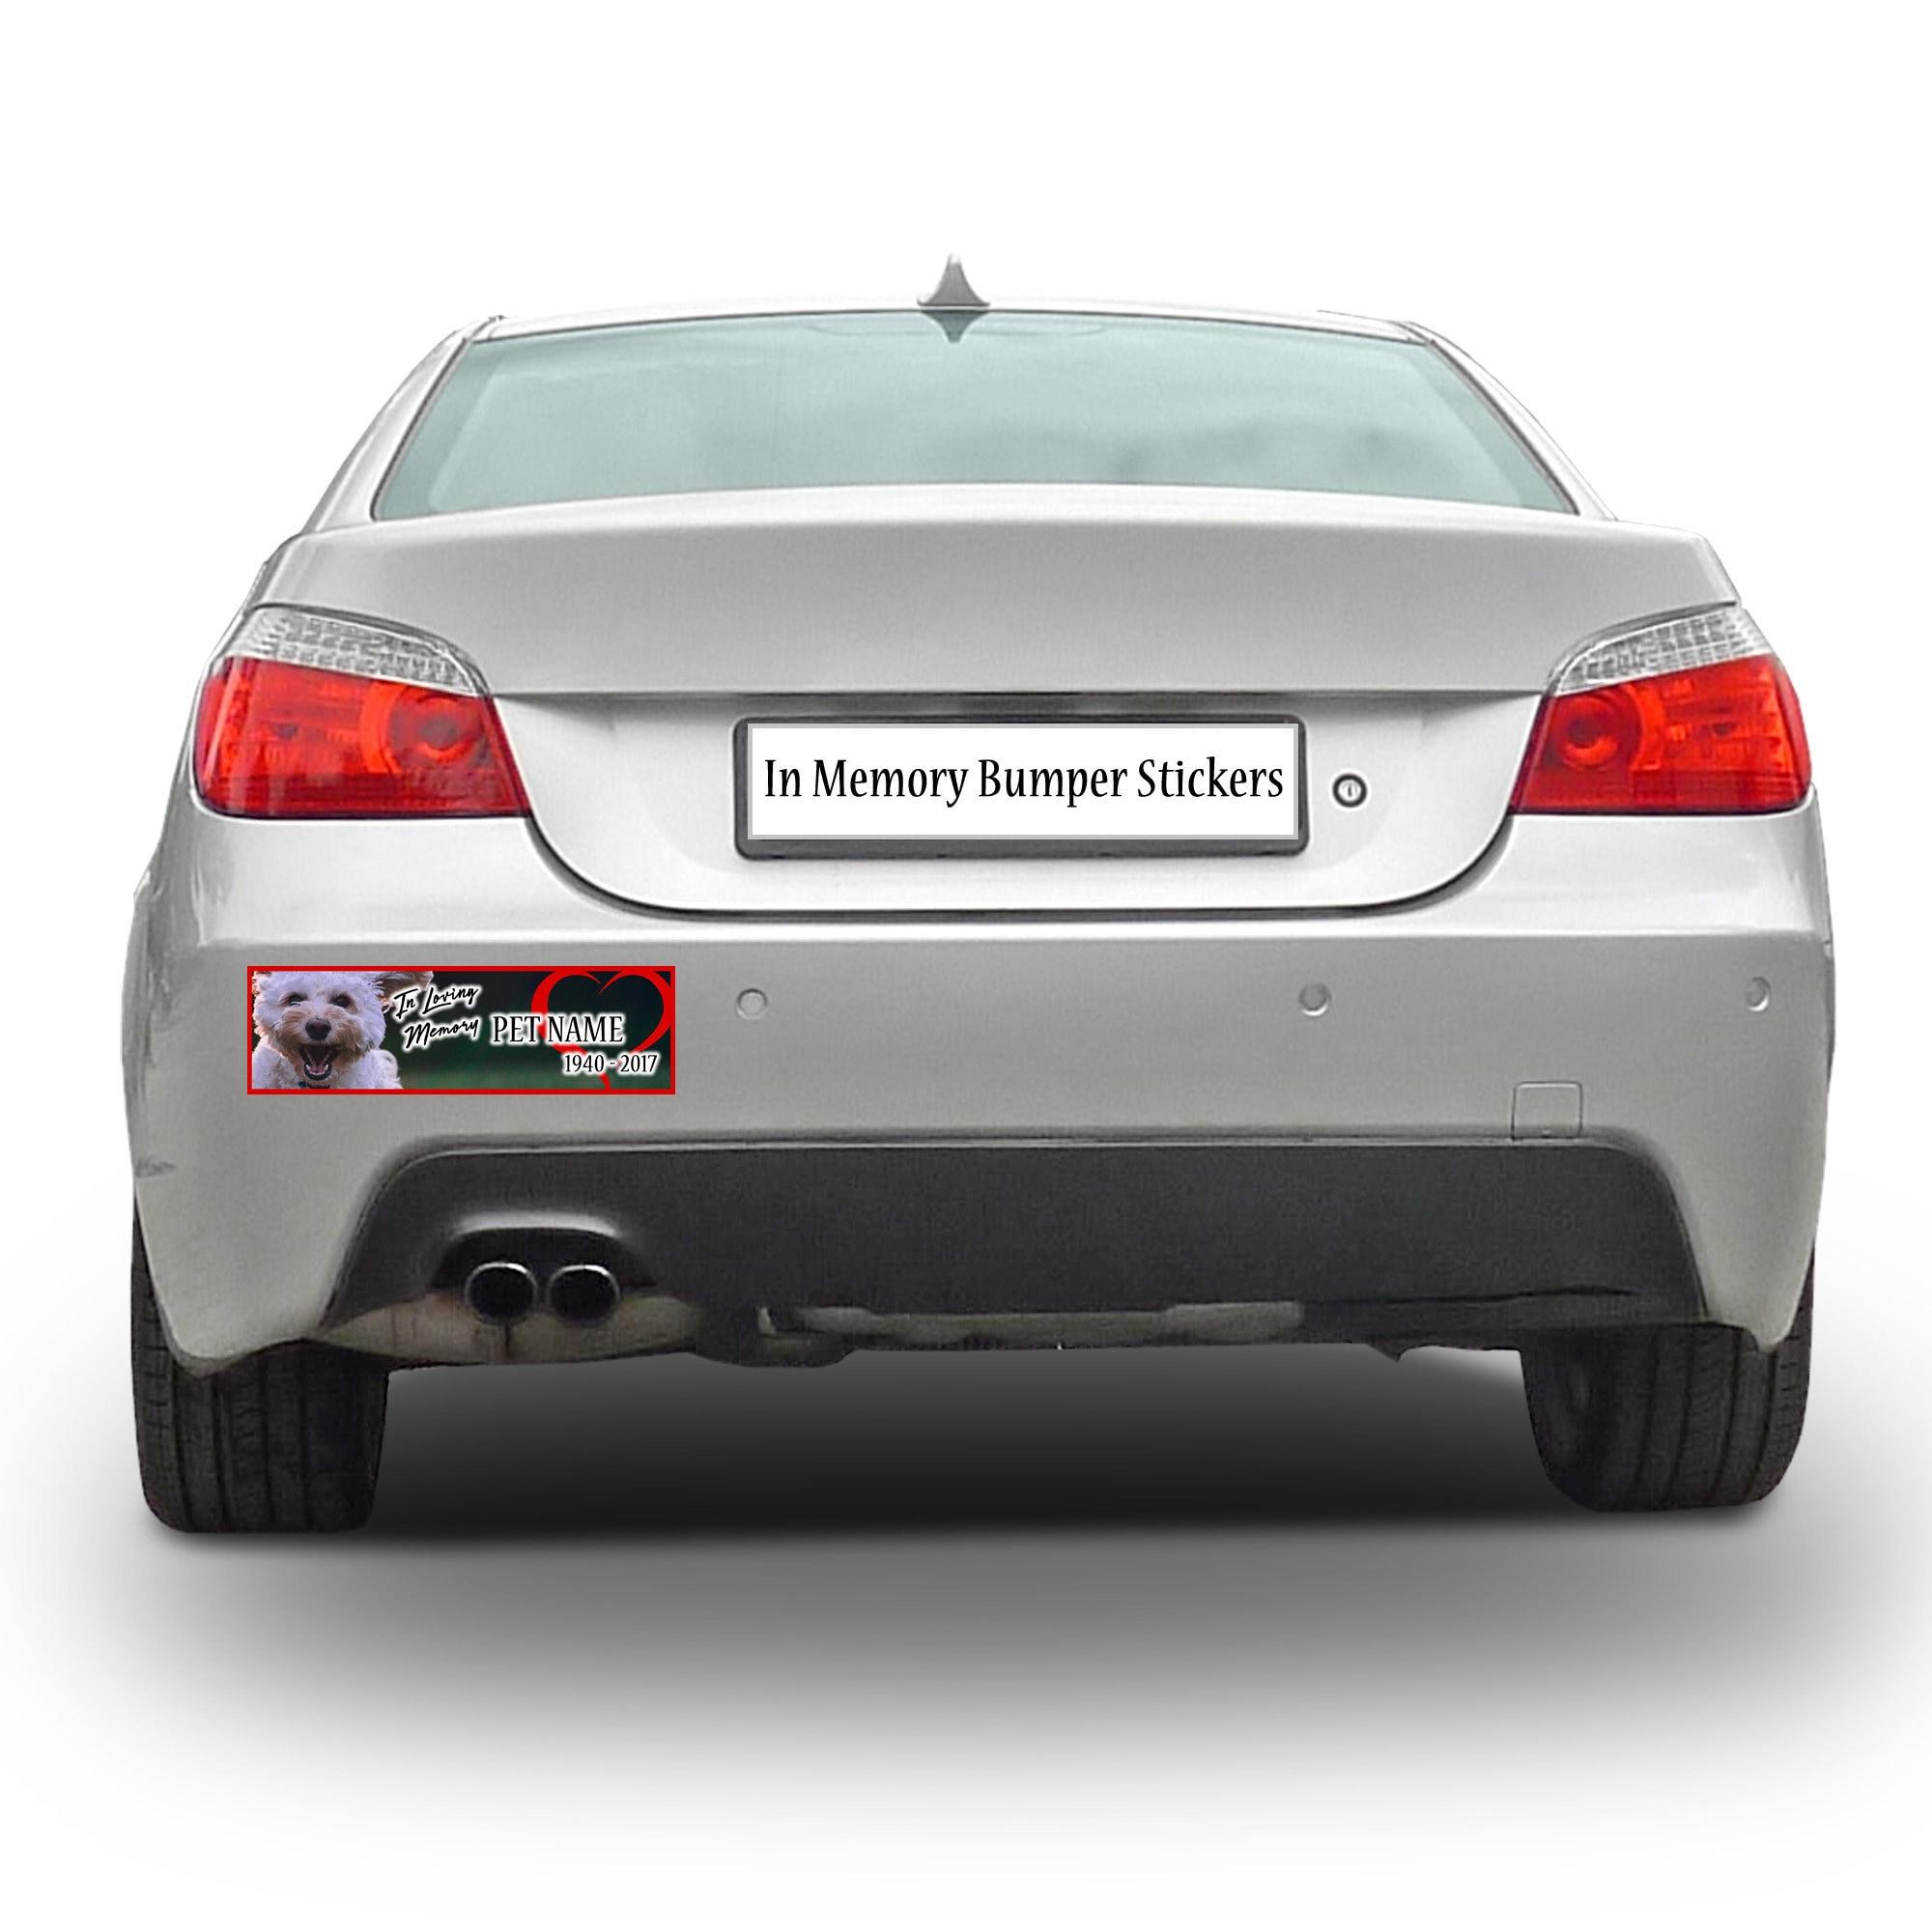 CAD$9.74 - In Loving Memory, In Memory, Pet, Dog, Cat, Rabbit memorial custom bumper sticker 10 x 3 or Magnetic Bumper Sticker Available